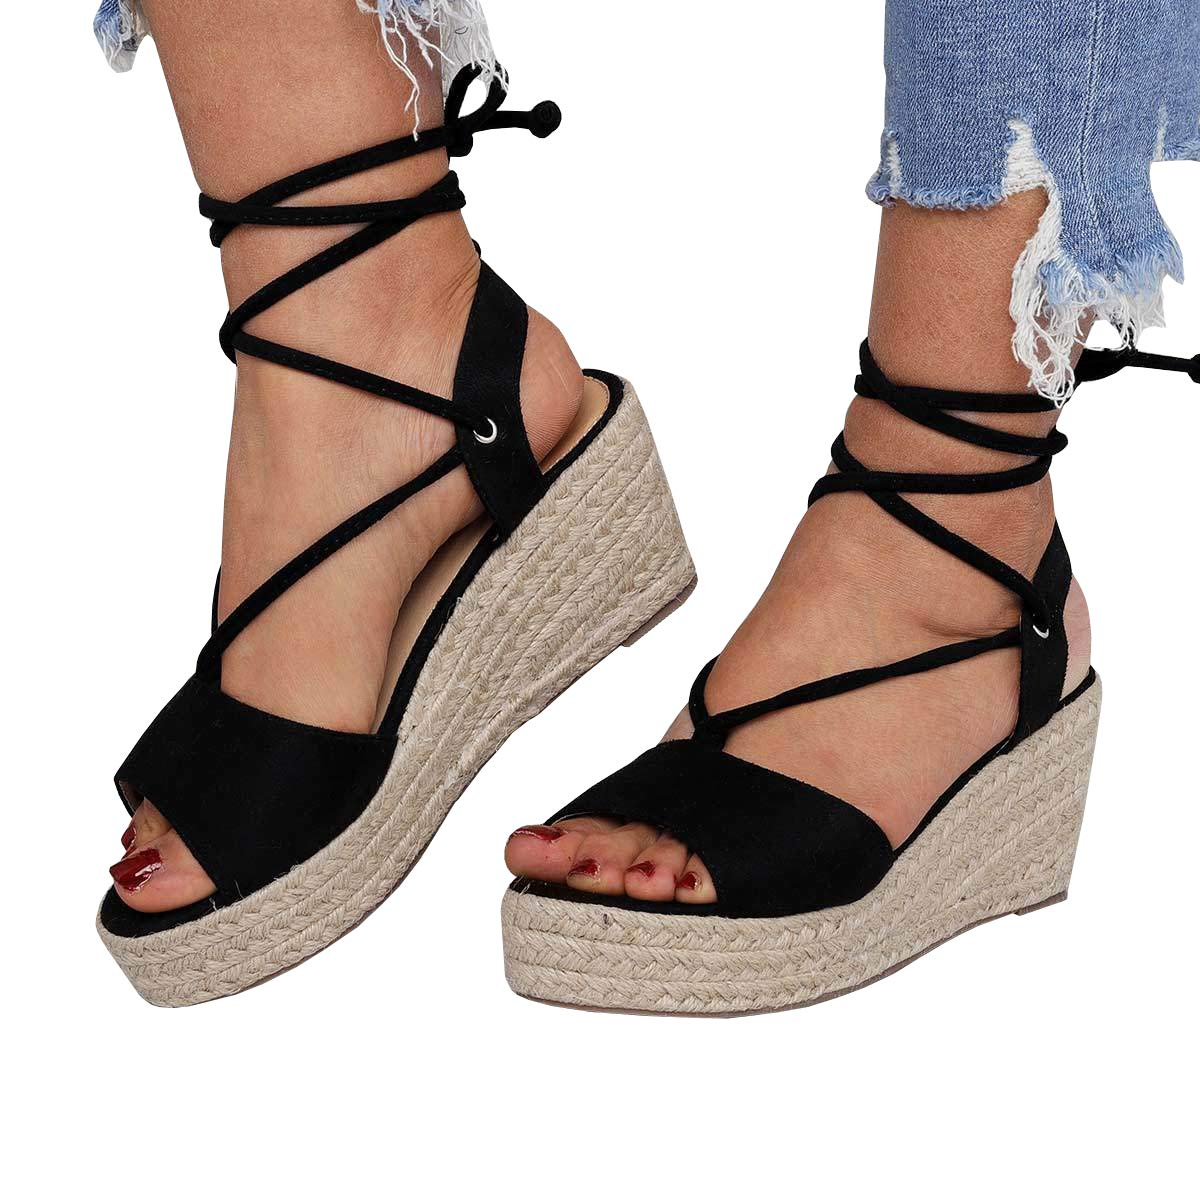 c3794481ec2 Amazon.com   Seraih Womens Peep Toe Platform Wedge Sandals Instep ...